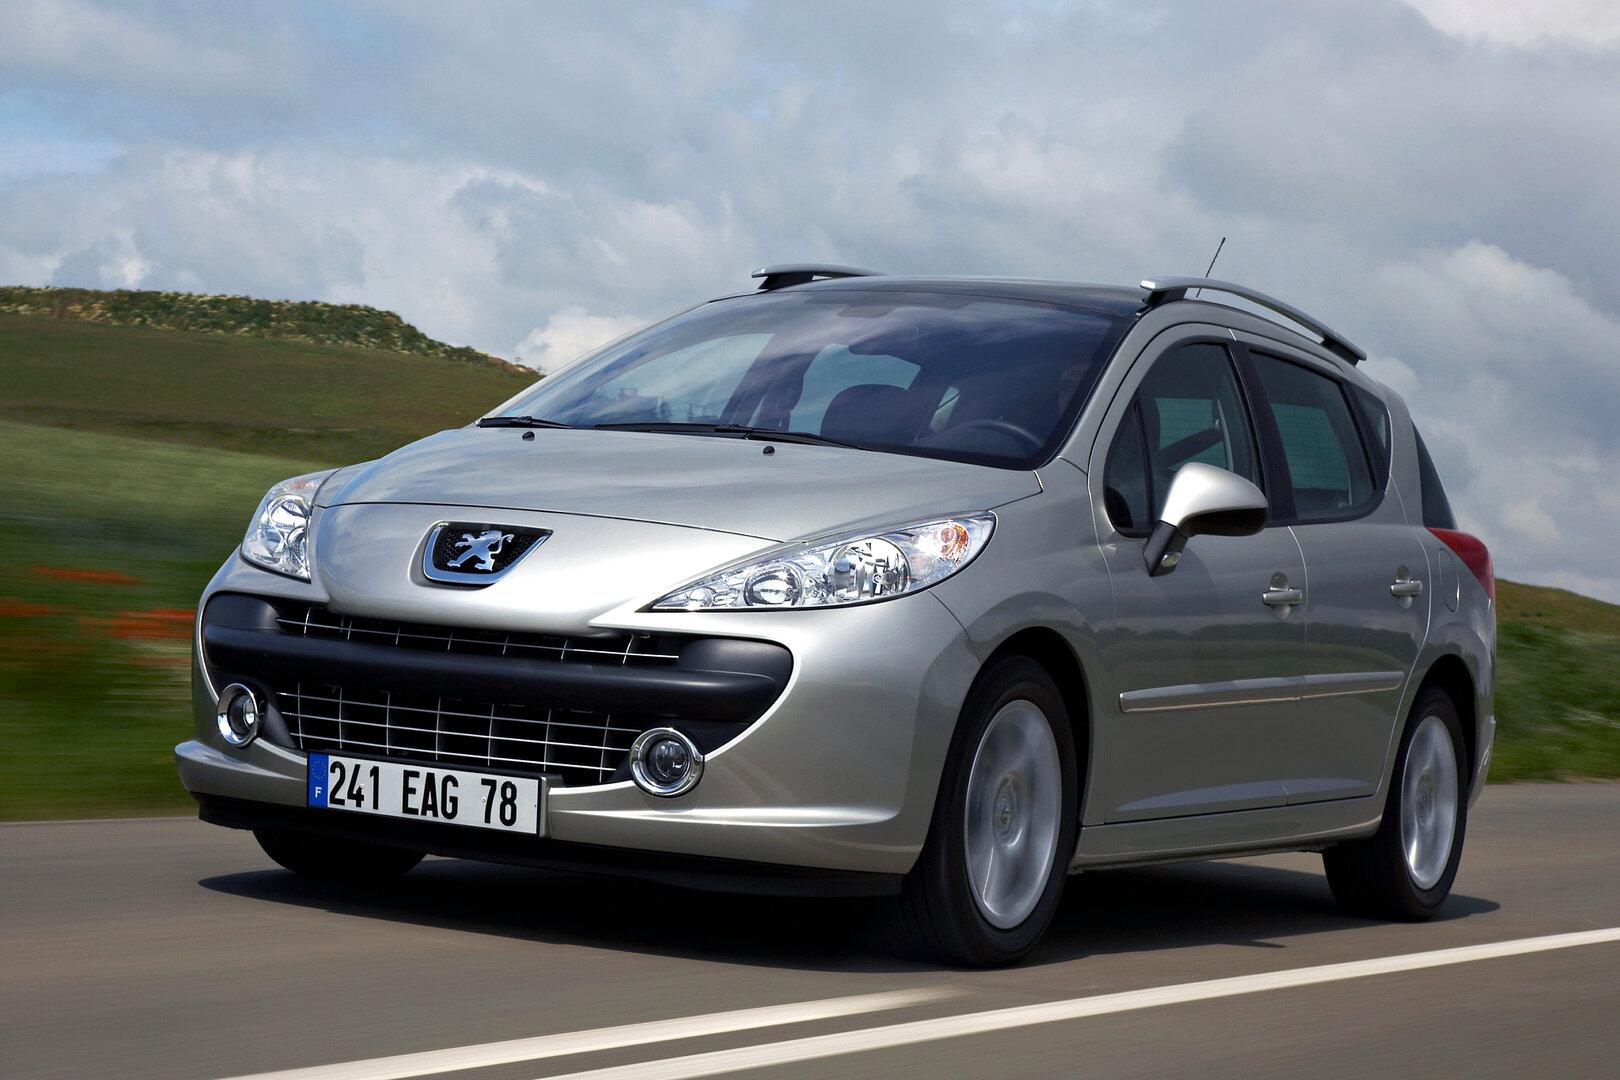 Coche del día: Peugeot 207 SW